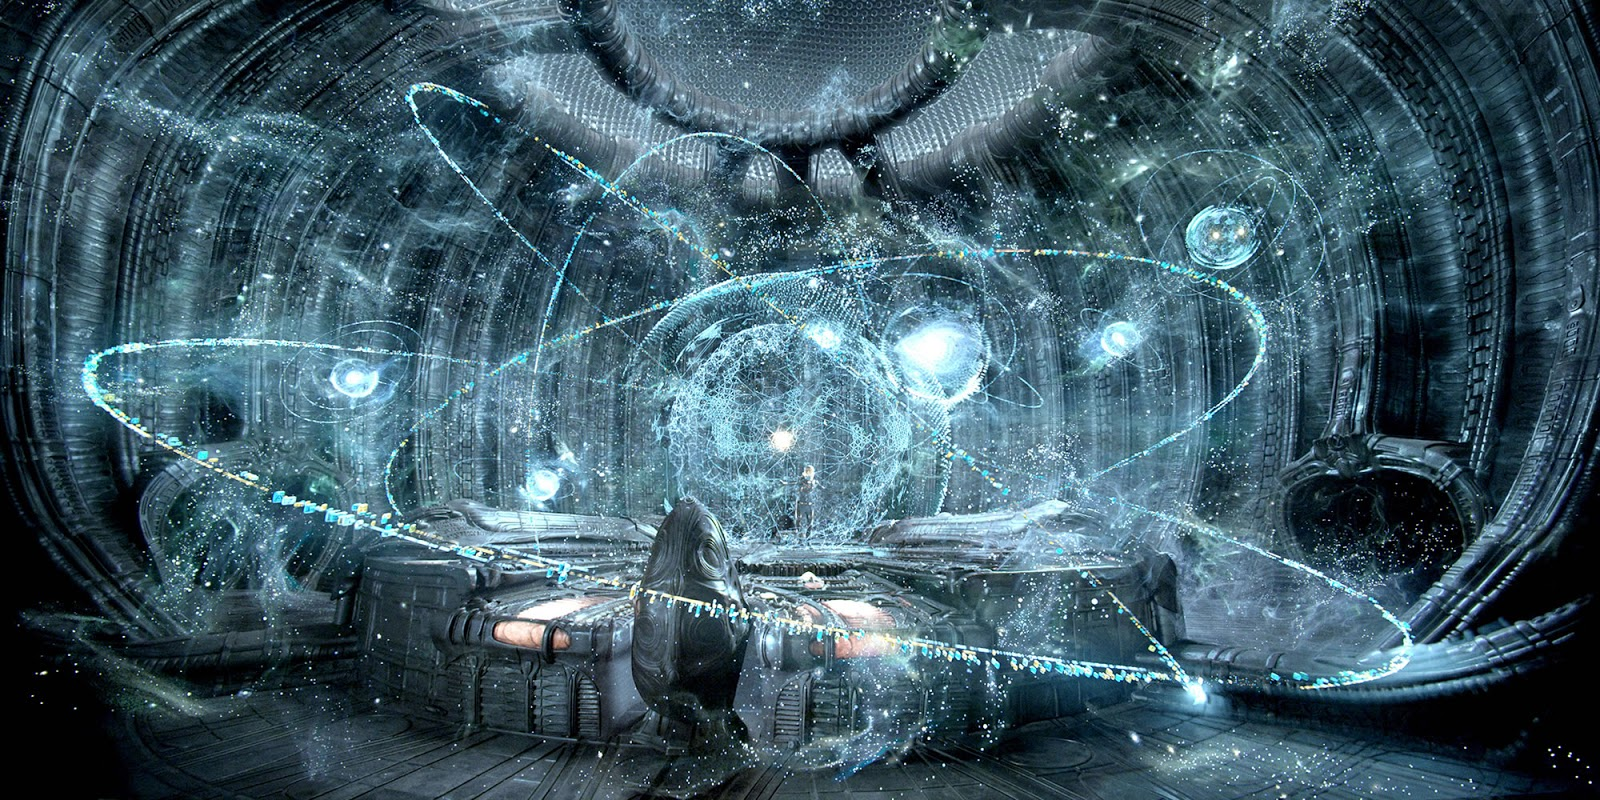 http://4.bp.blogspot.com/-RnMC_DvEmZs/UMy9G10JxkI/AAAAAAAABfE/A-57VkCCeGQ/s1600/prometheus-movie-image1.jpg